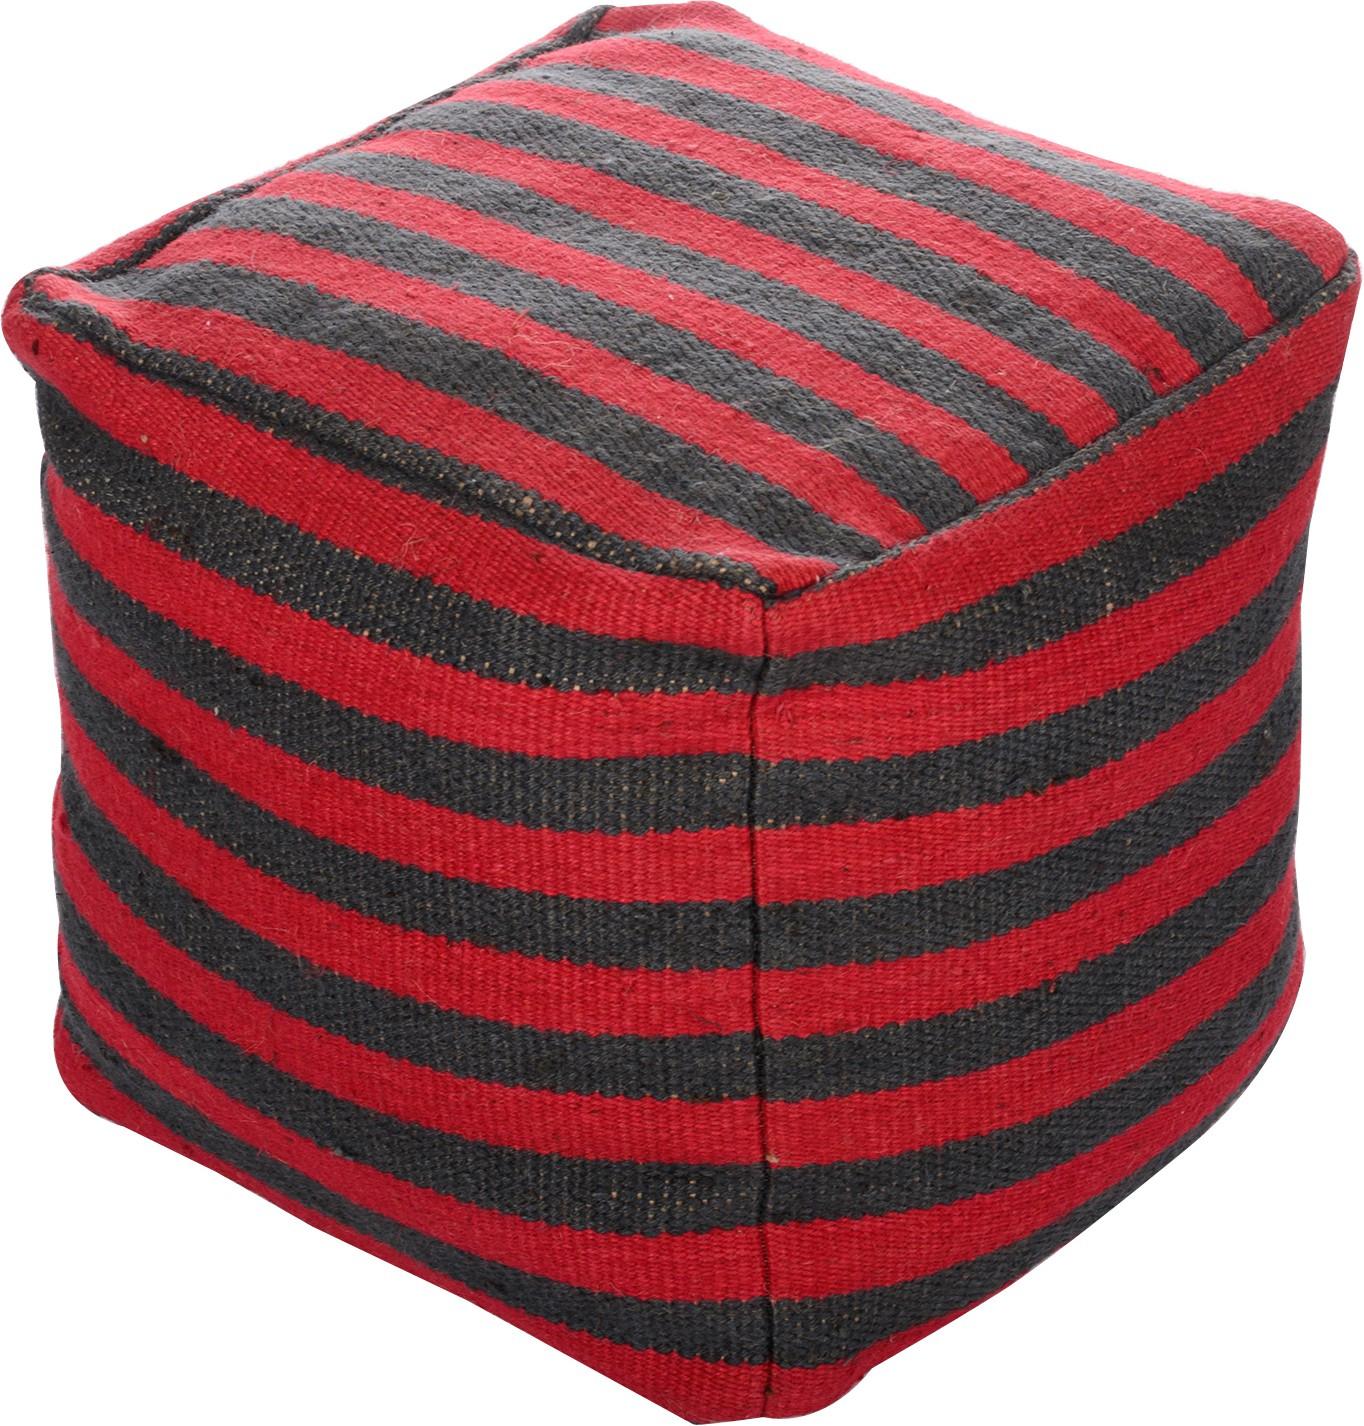 View Artasia Fabric Pouf(Finish Color - Red) Furniture (Artasia)